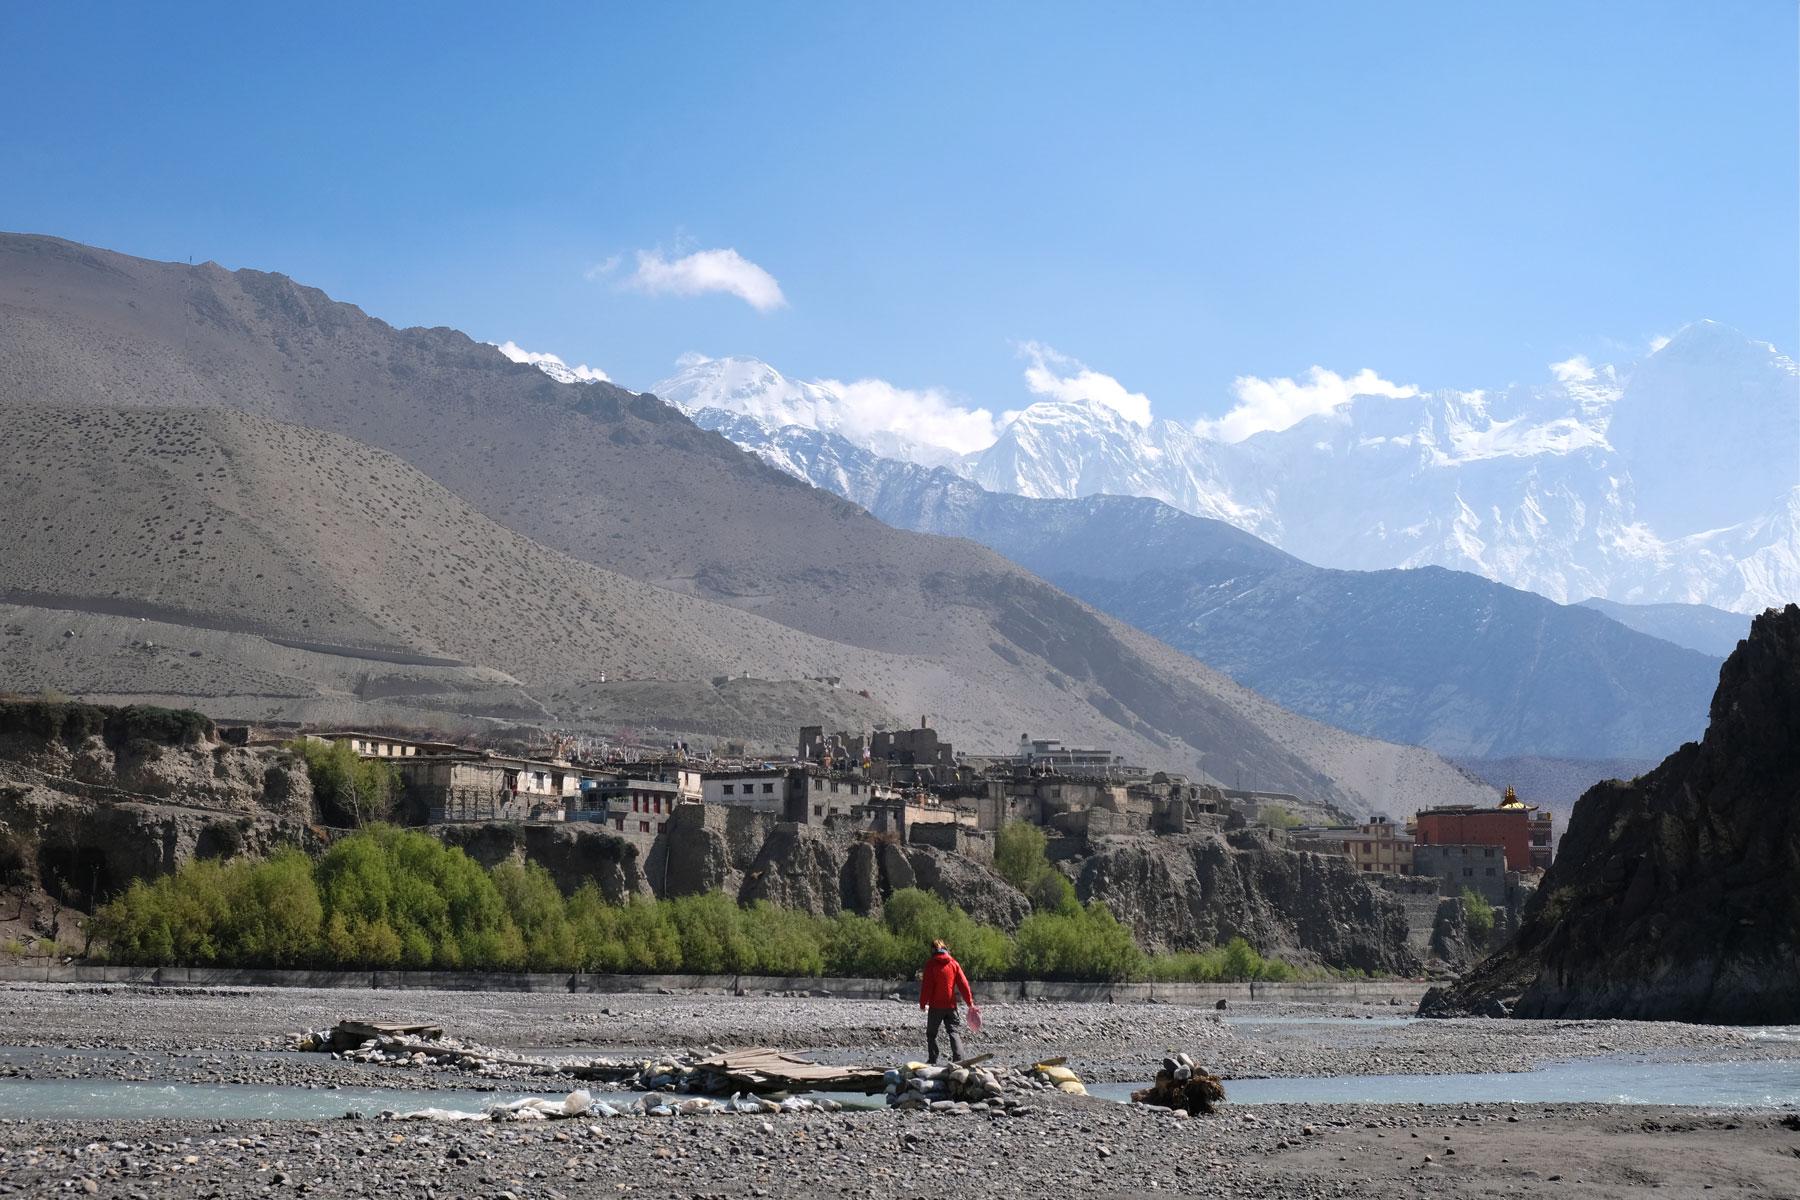 Sebastian im Flussbett des Kali Gandaki vor dem Dorf Kagbeni.